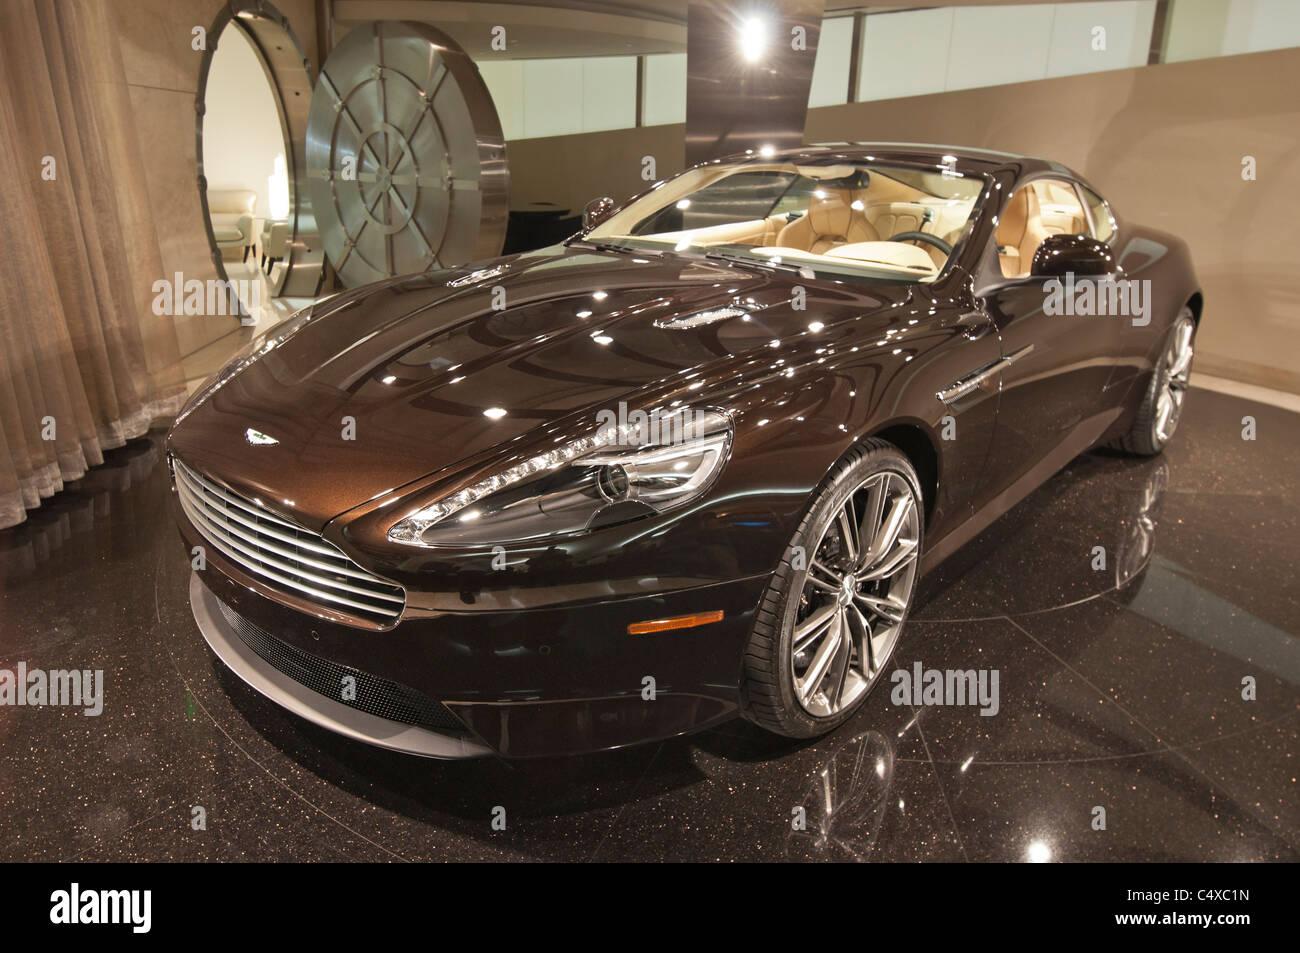 Galpin Motors Club Aston Martin Showroom Stock Photo Alamy - Galpin aston martin